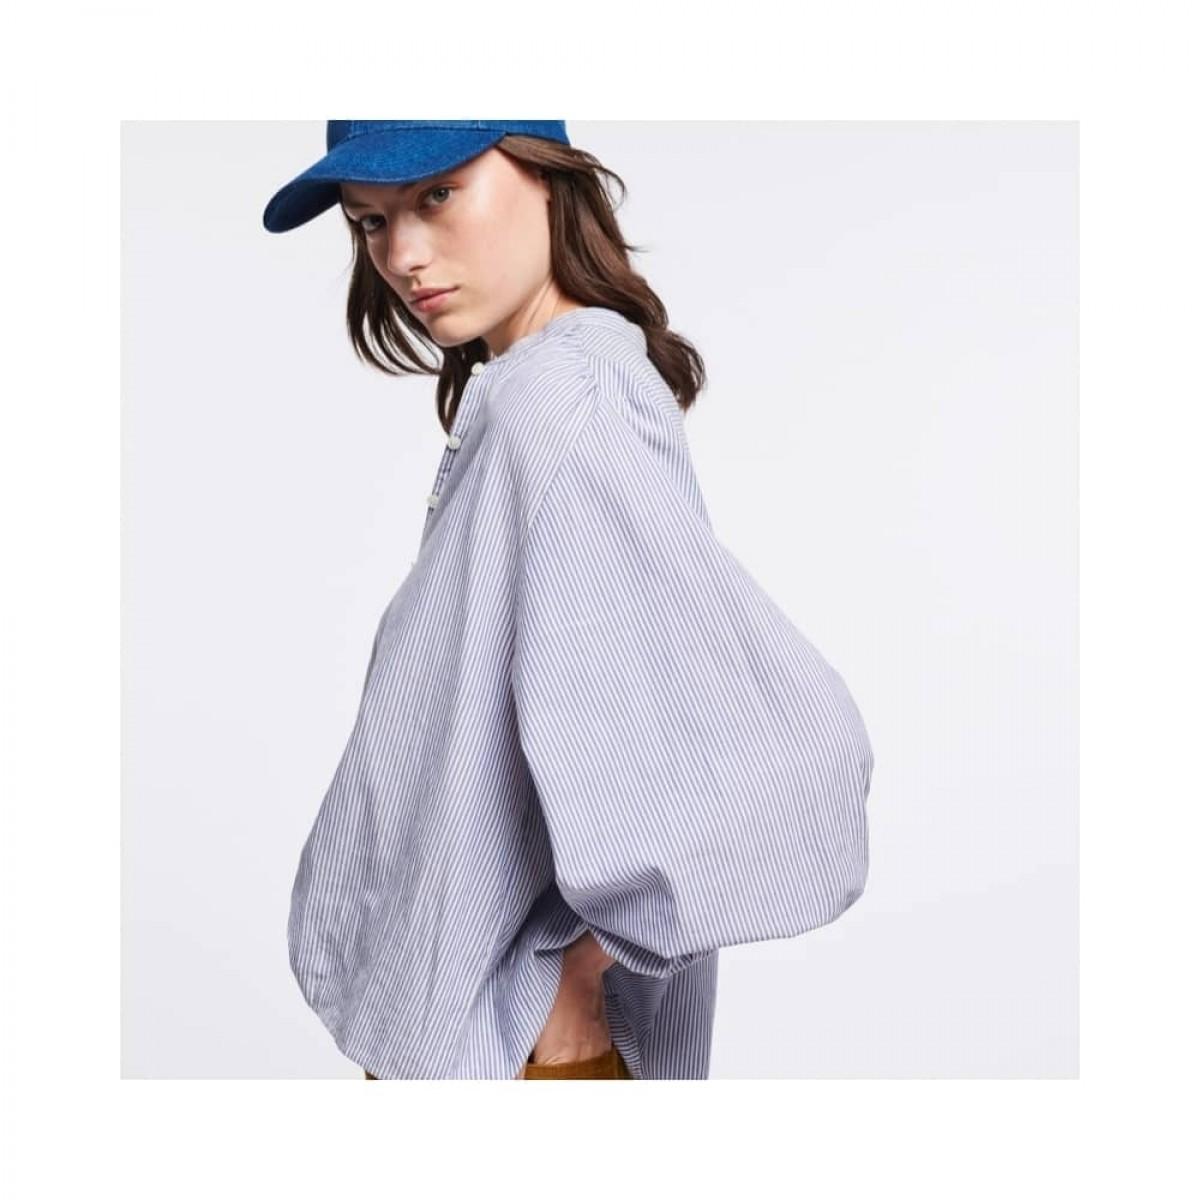 mederic bluse - blue - model fra siden